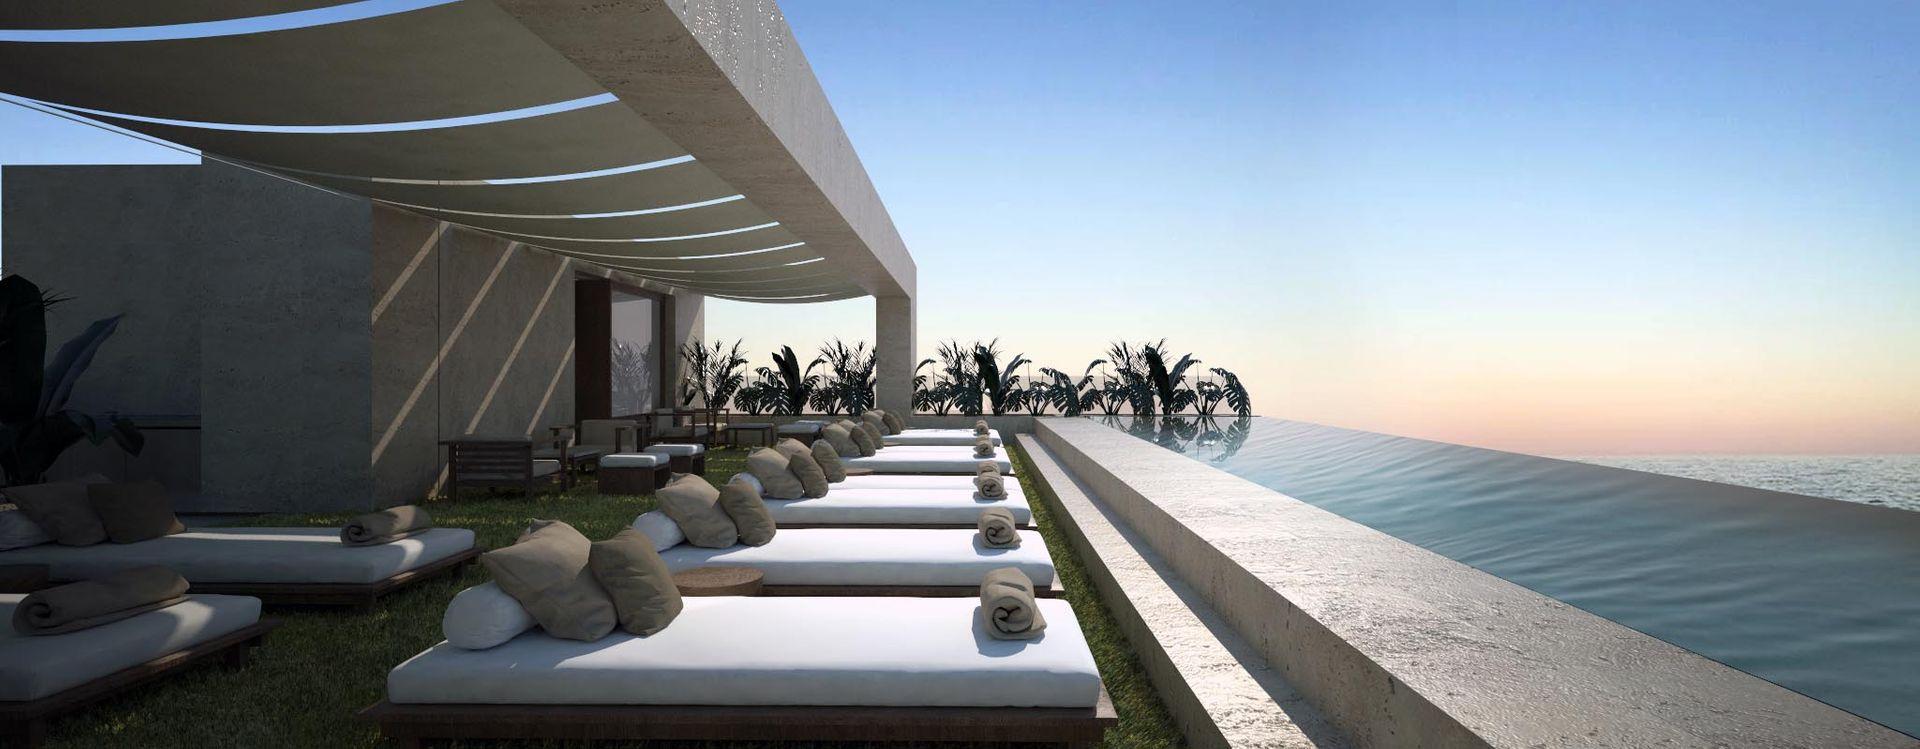 4* SanSal Boutique Hotel - Χανια, Κρητη ✦ -25% ✦ 4 Ημερες (3 Διανυκτερευσεις) ✦ 2 ατομα ✦ Πρωινο ✦ 01/09/2020 εως 30/09/2020 ✦ Free WiFi!